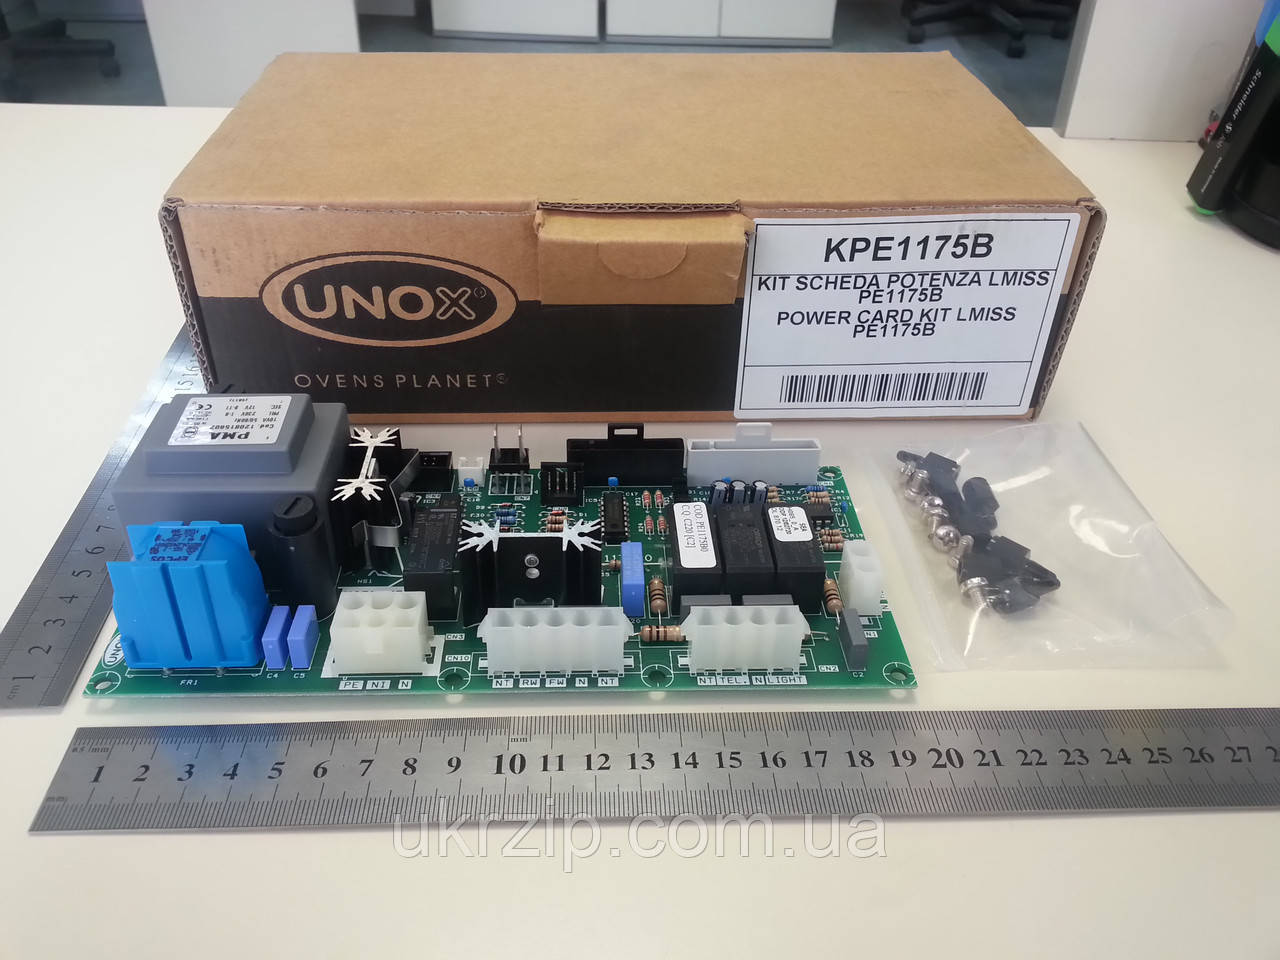 Плата силовая PE1175, KPE004 для печей Unox LineMiss XF135-185-195